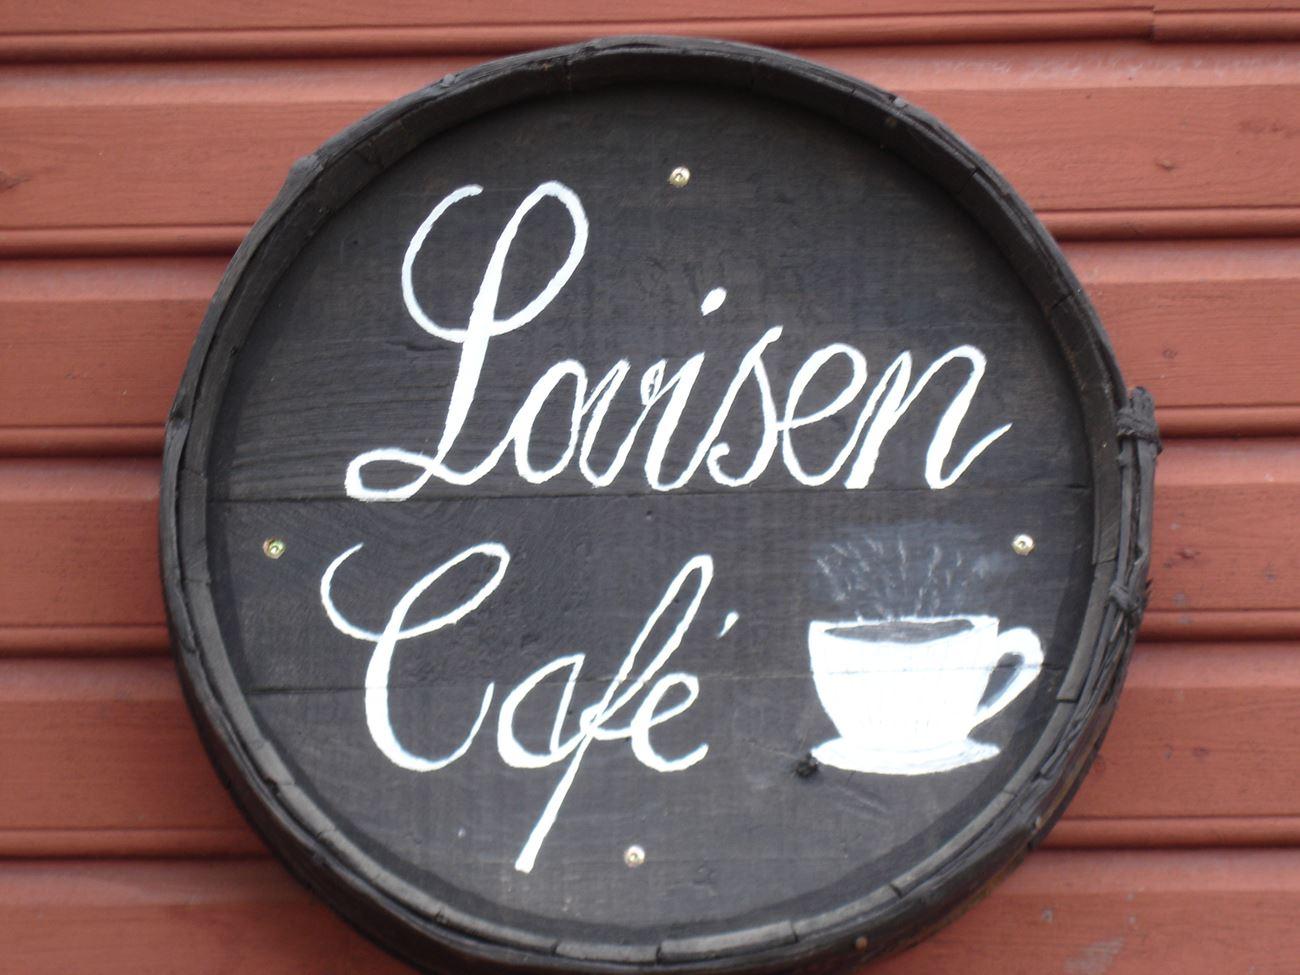 © Café Lovisen, Café Lovisen